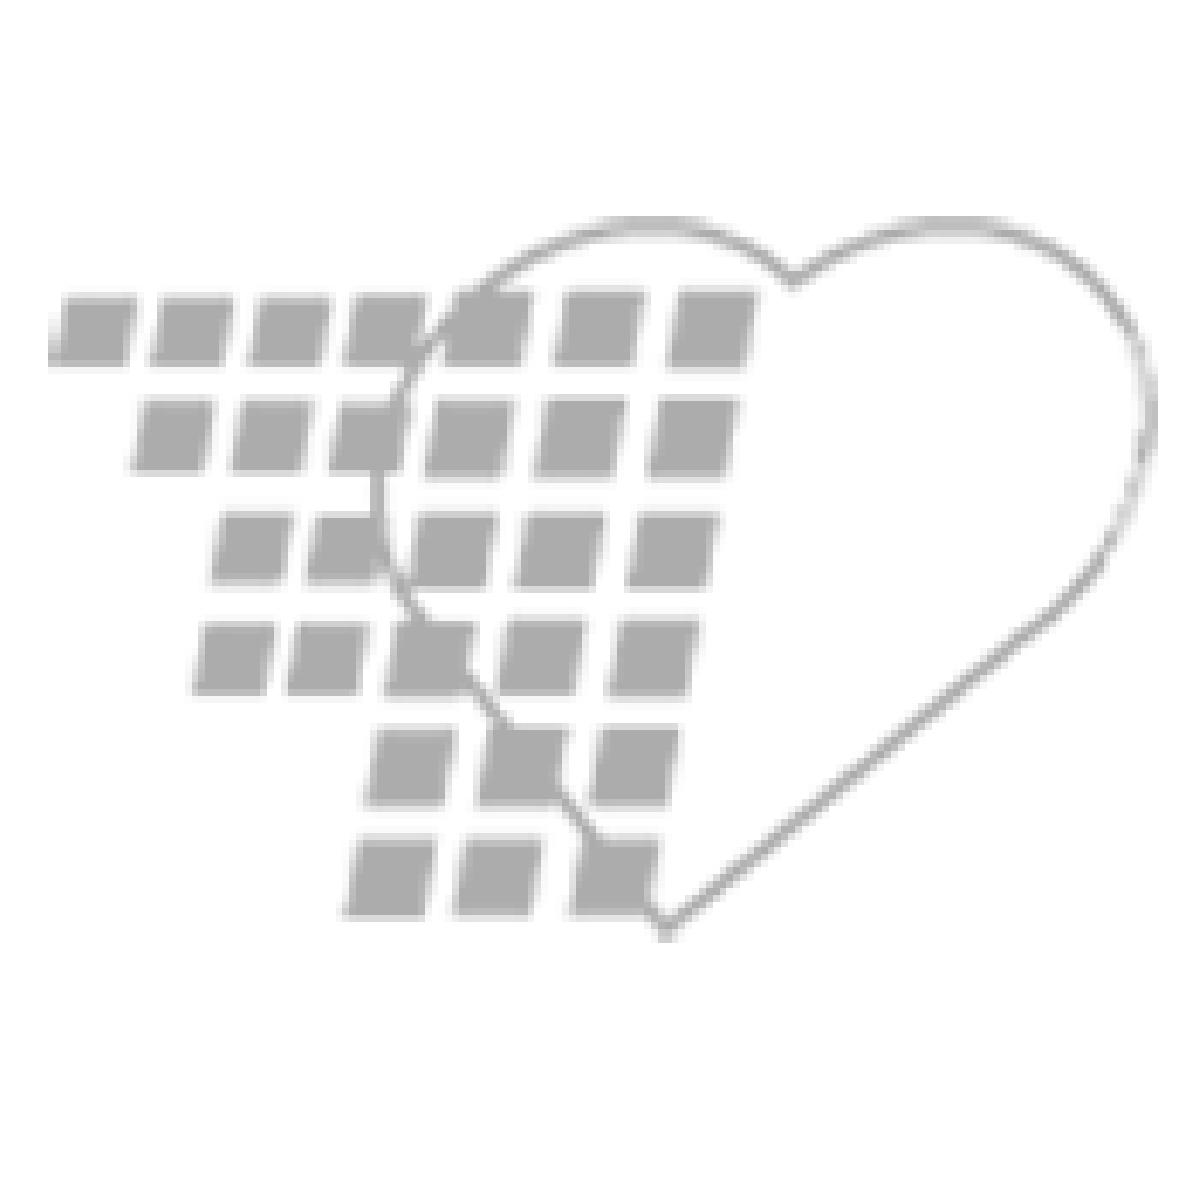 11-81-1027 Nasco Life/form® Peritoneal Dialysis Simulator